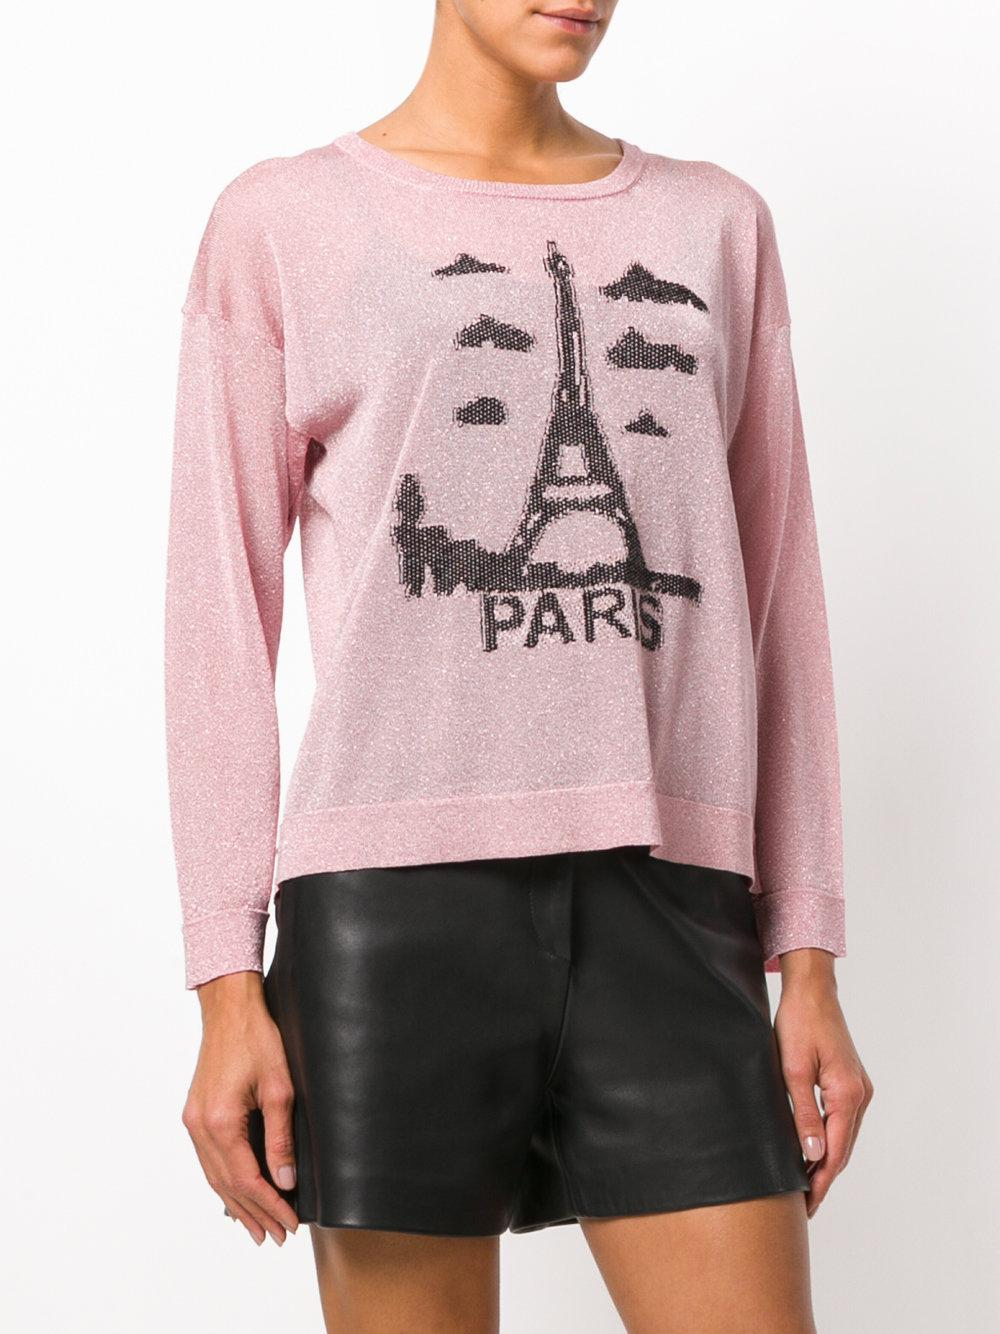 dddd14da6ecc83 Twin Set Paris Jumper in Pink - Lyst